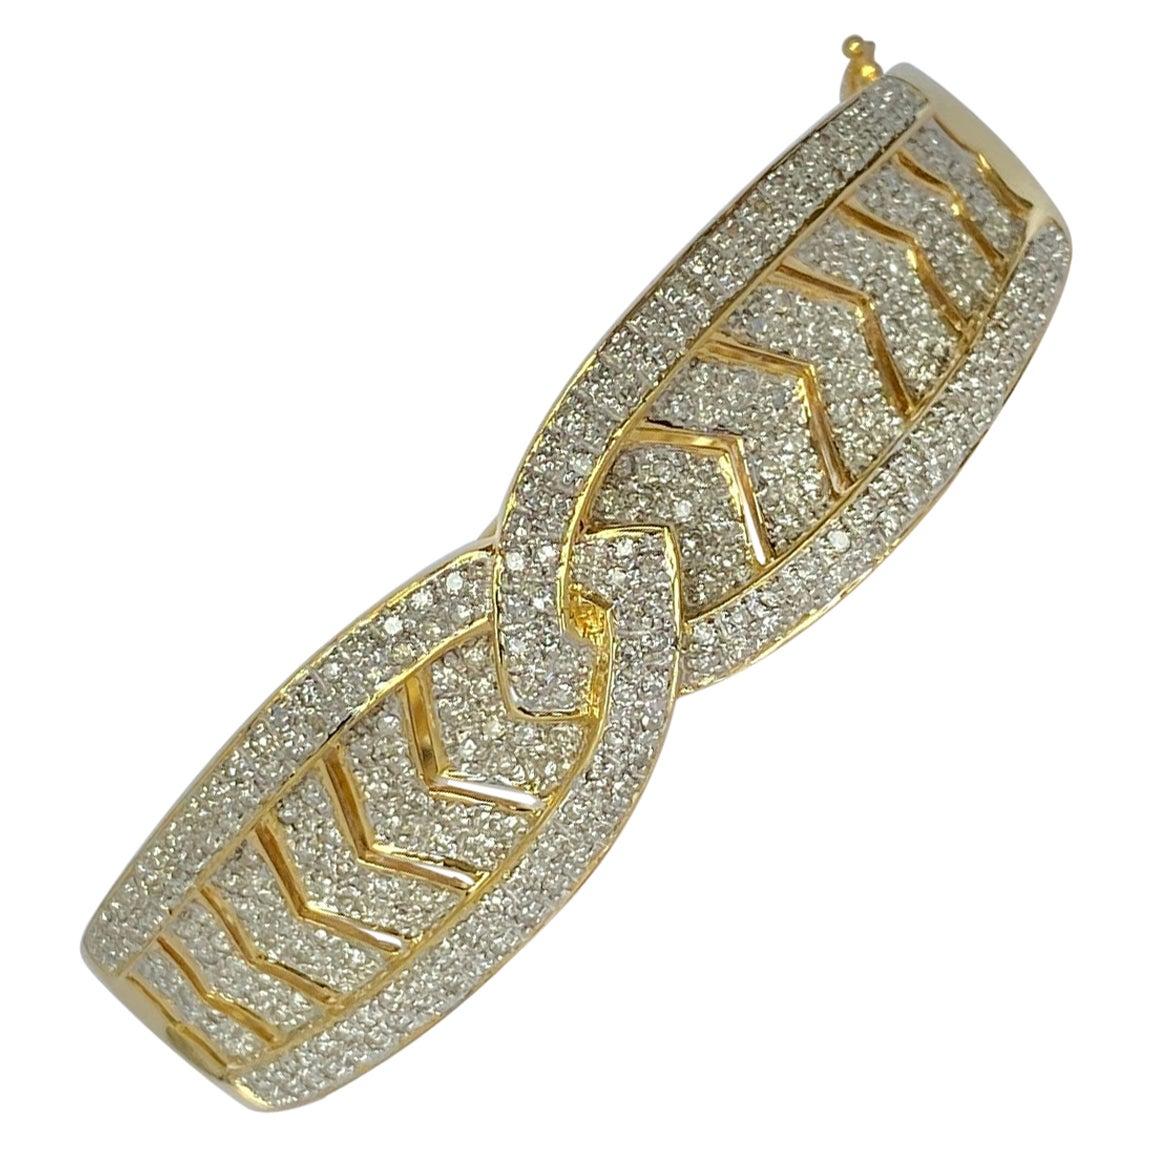 Modern Diamond and 18 Carat Gold Bangle Bracelet